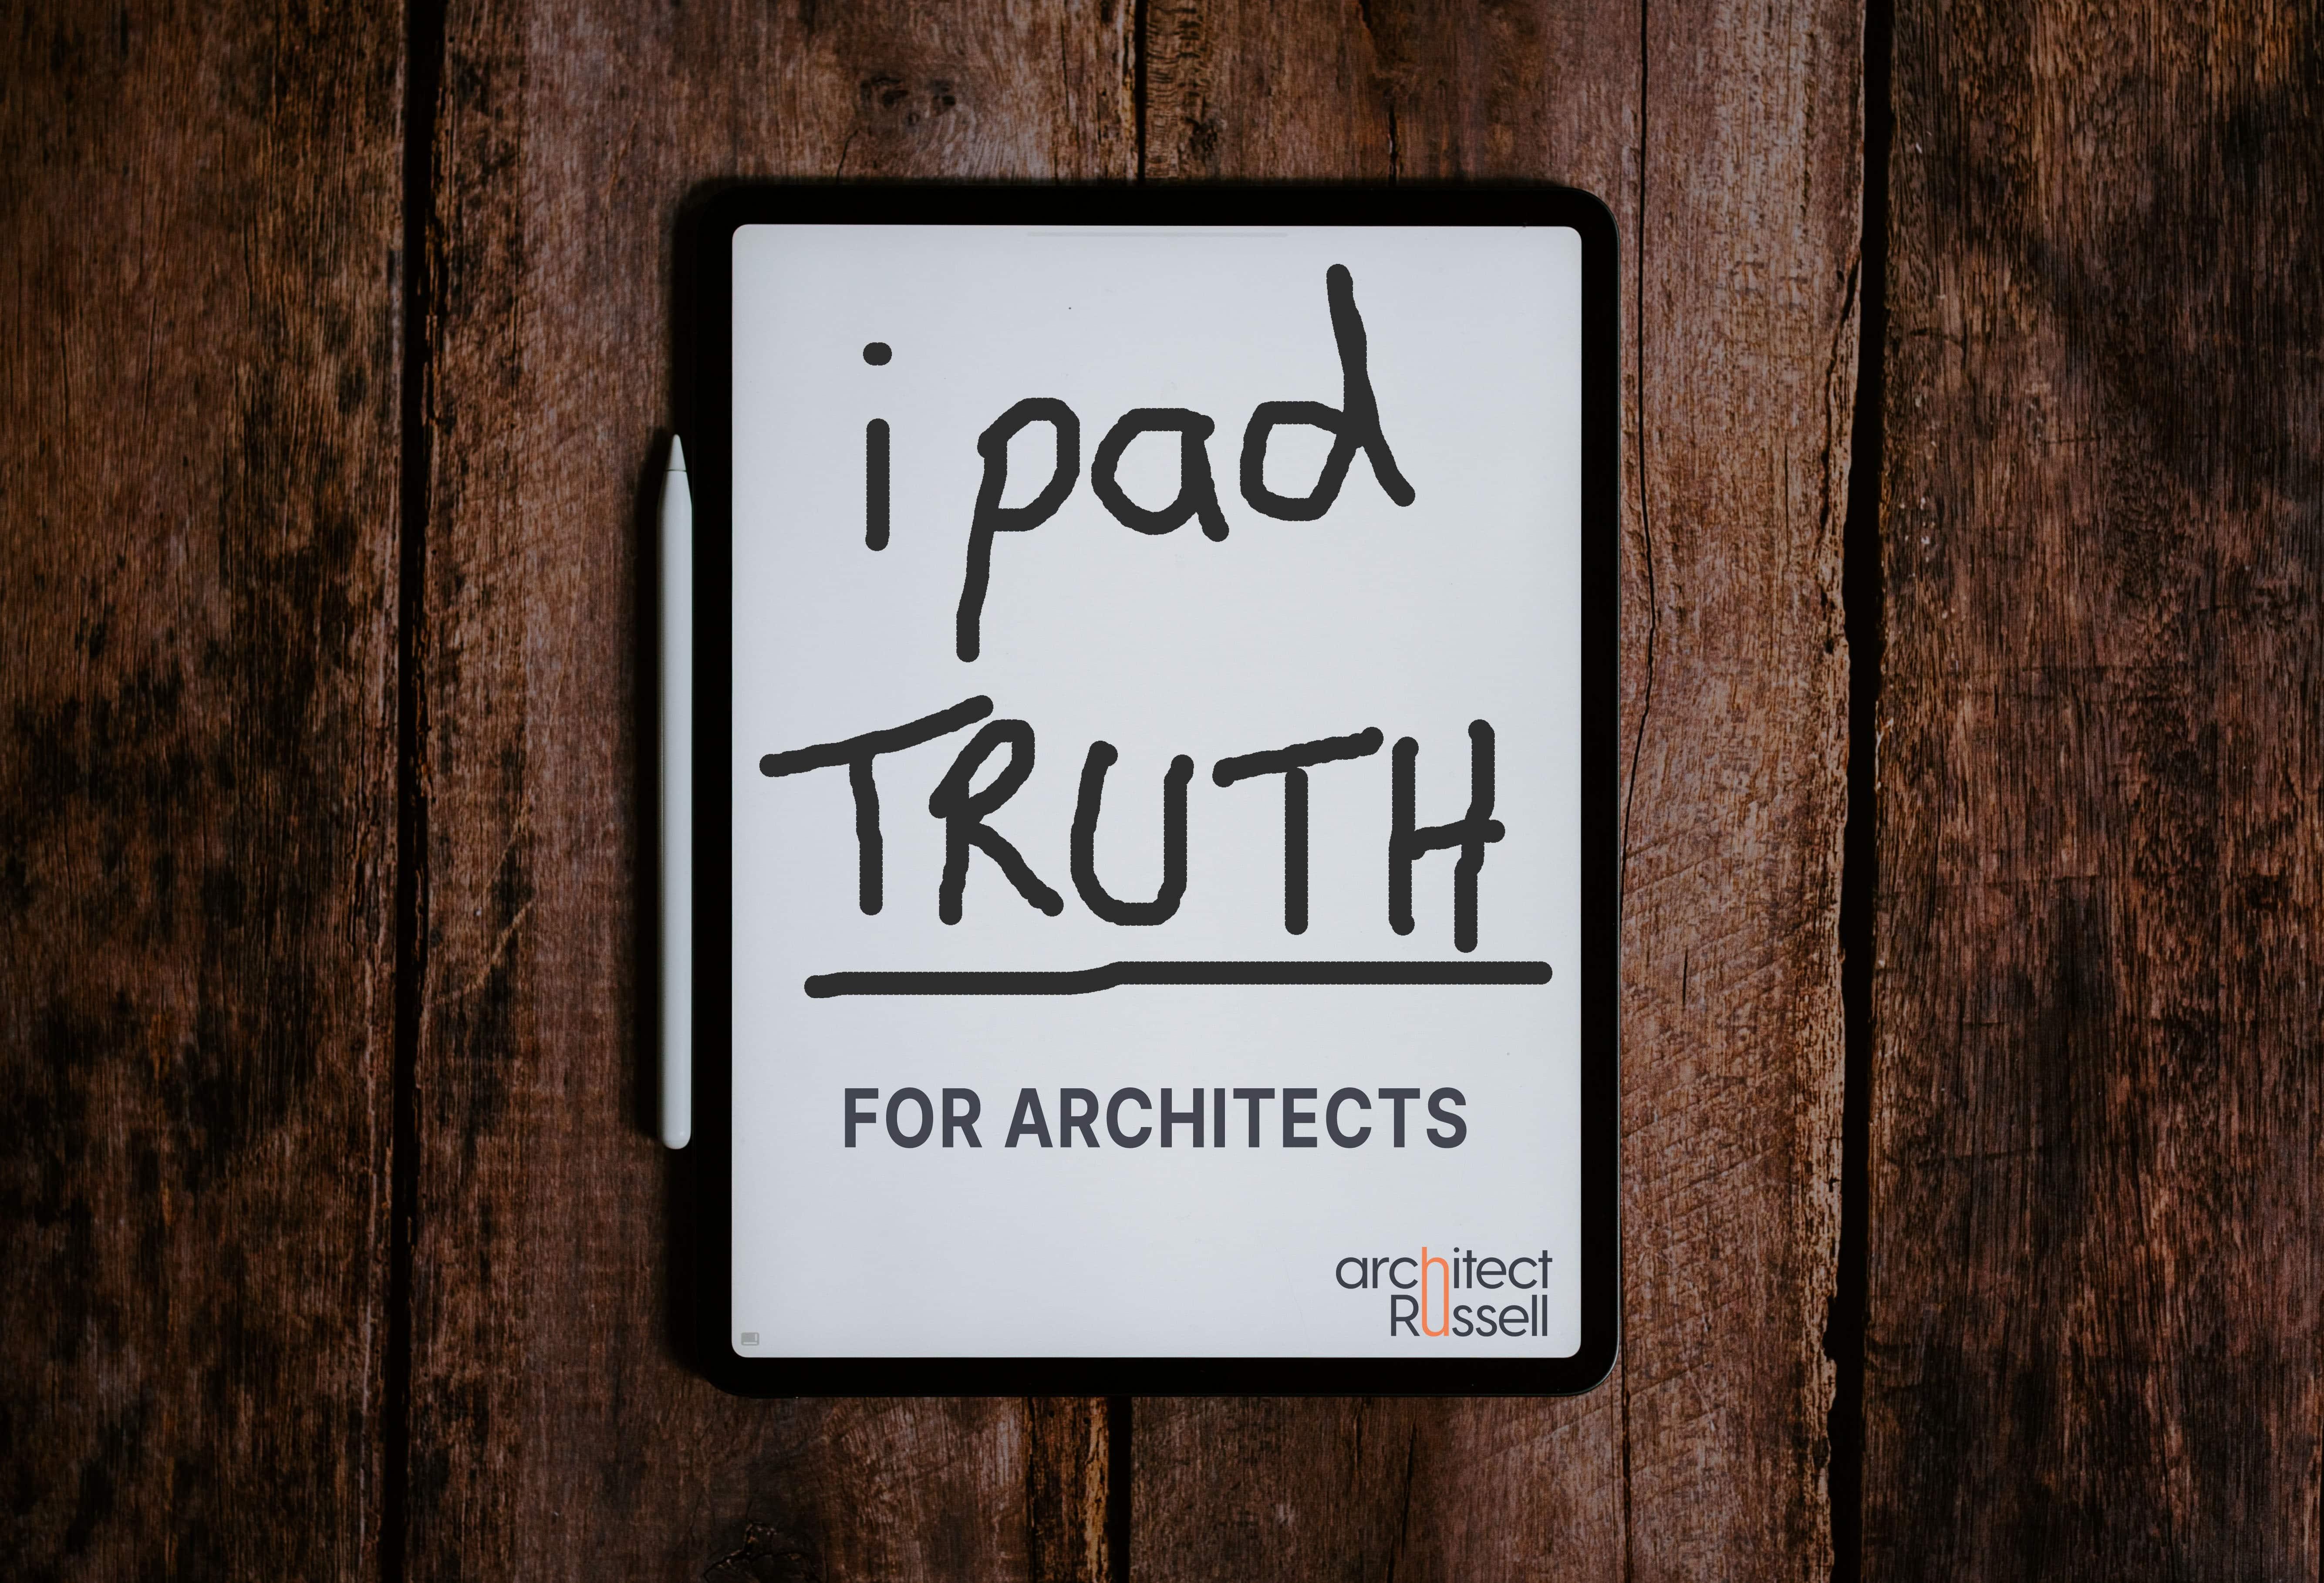 Ipad for architects